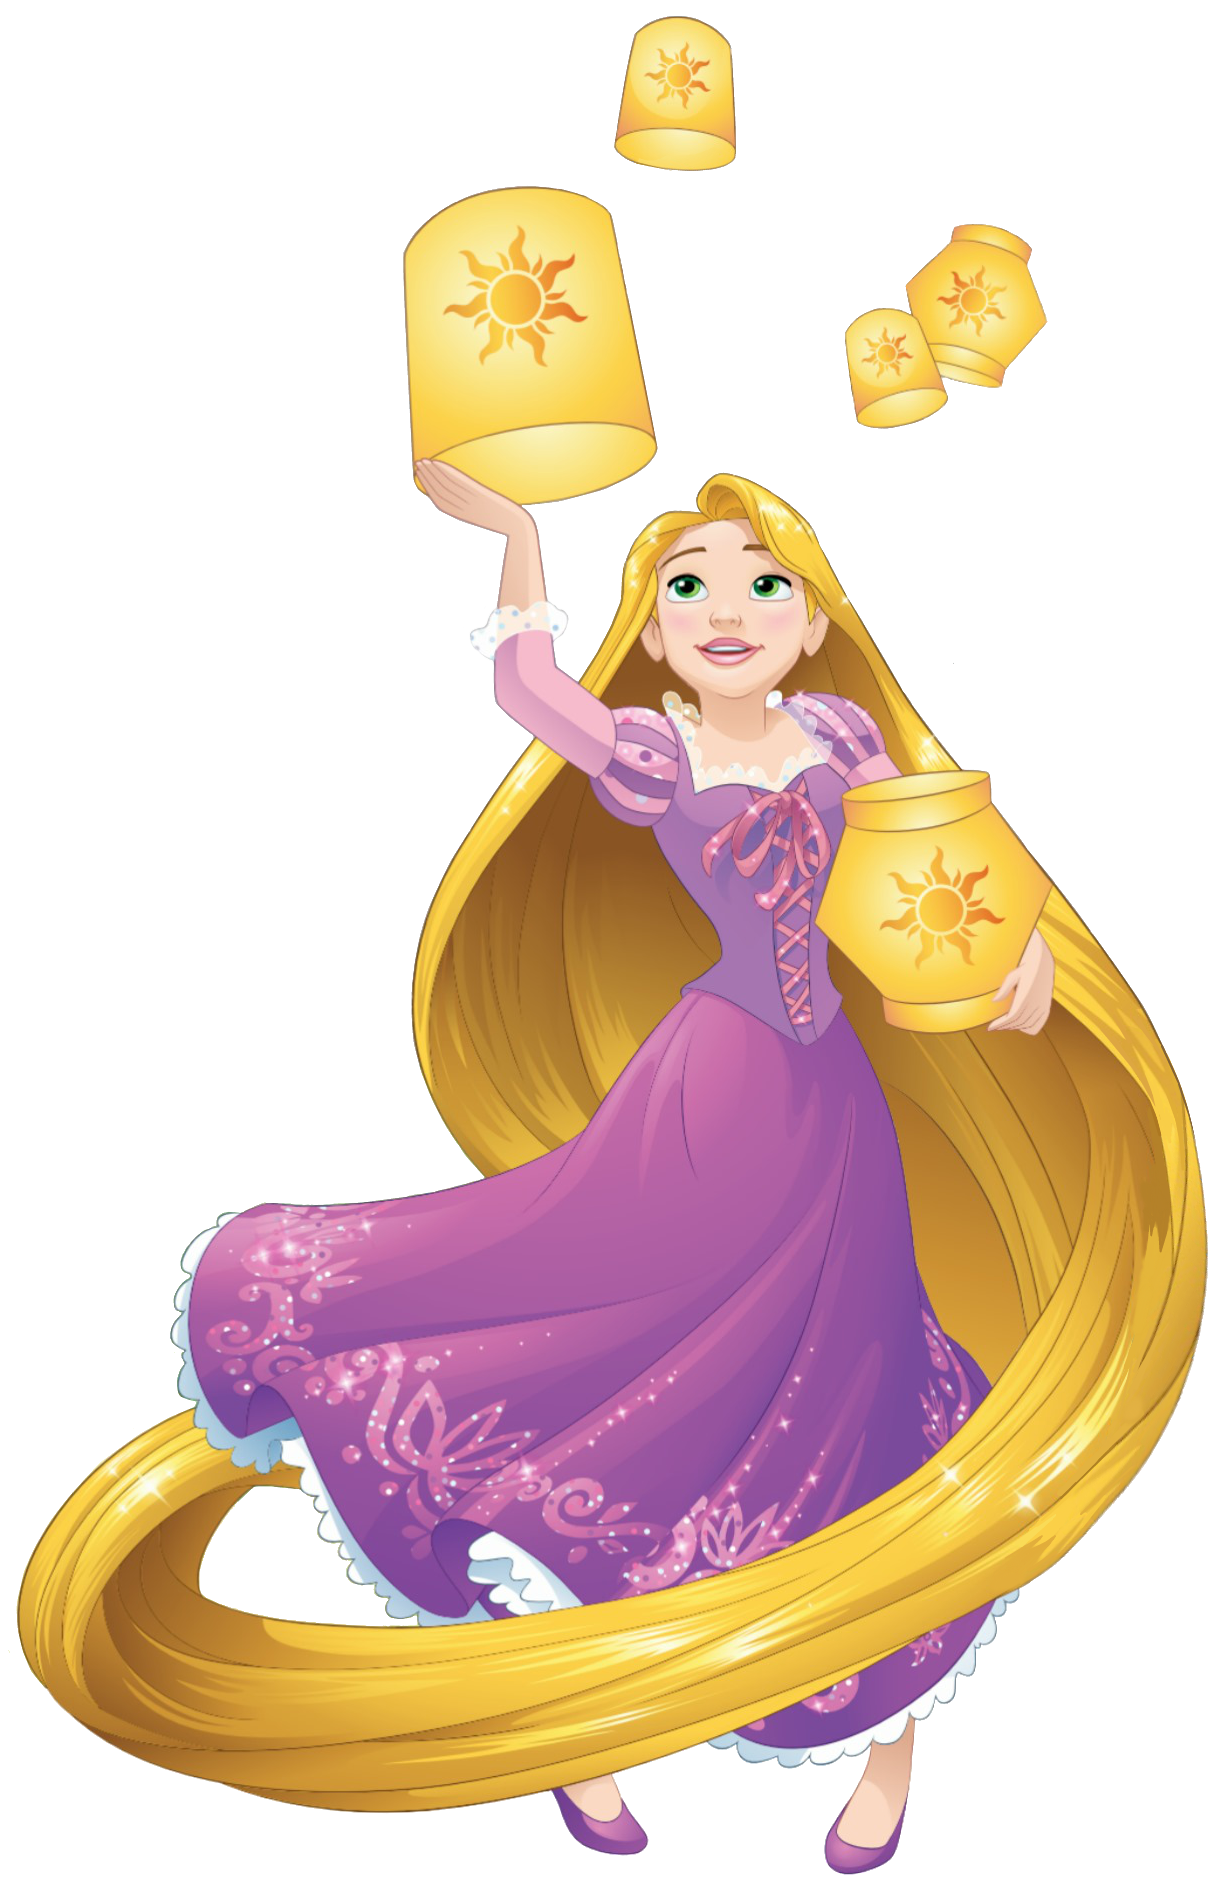 Rapunzel clipart rapunzel character, Rapunzel rapunzel ...